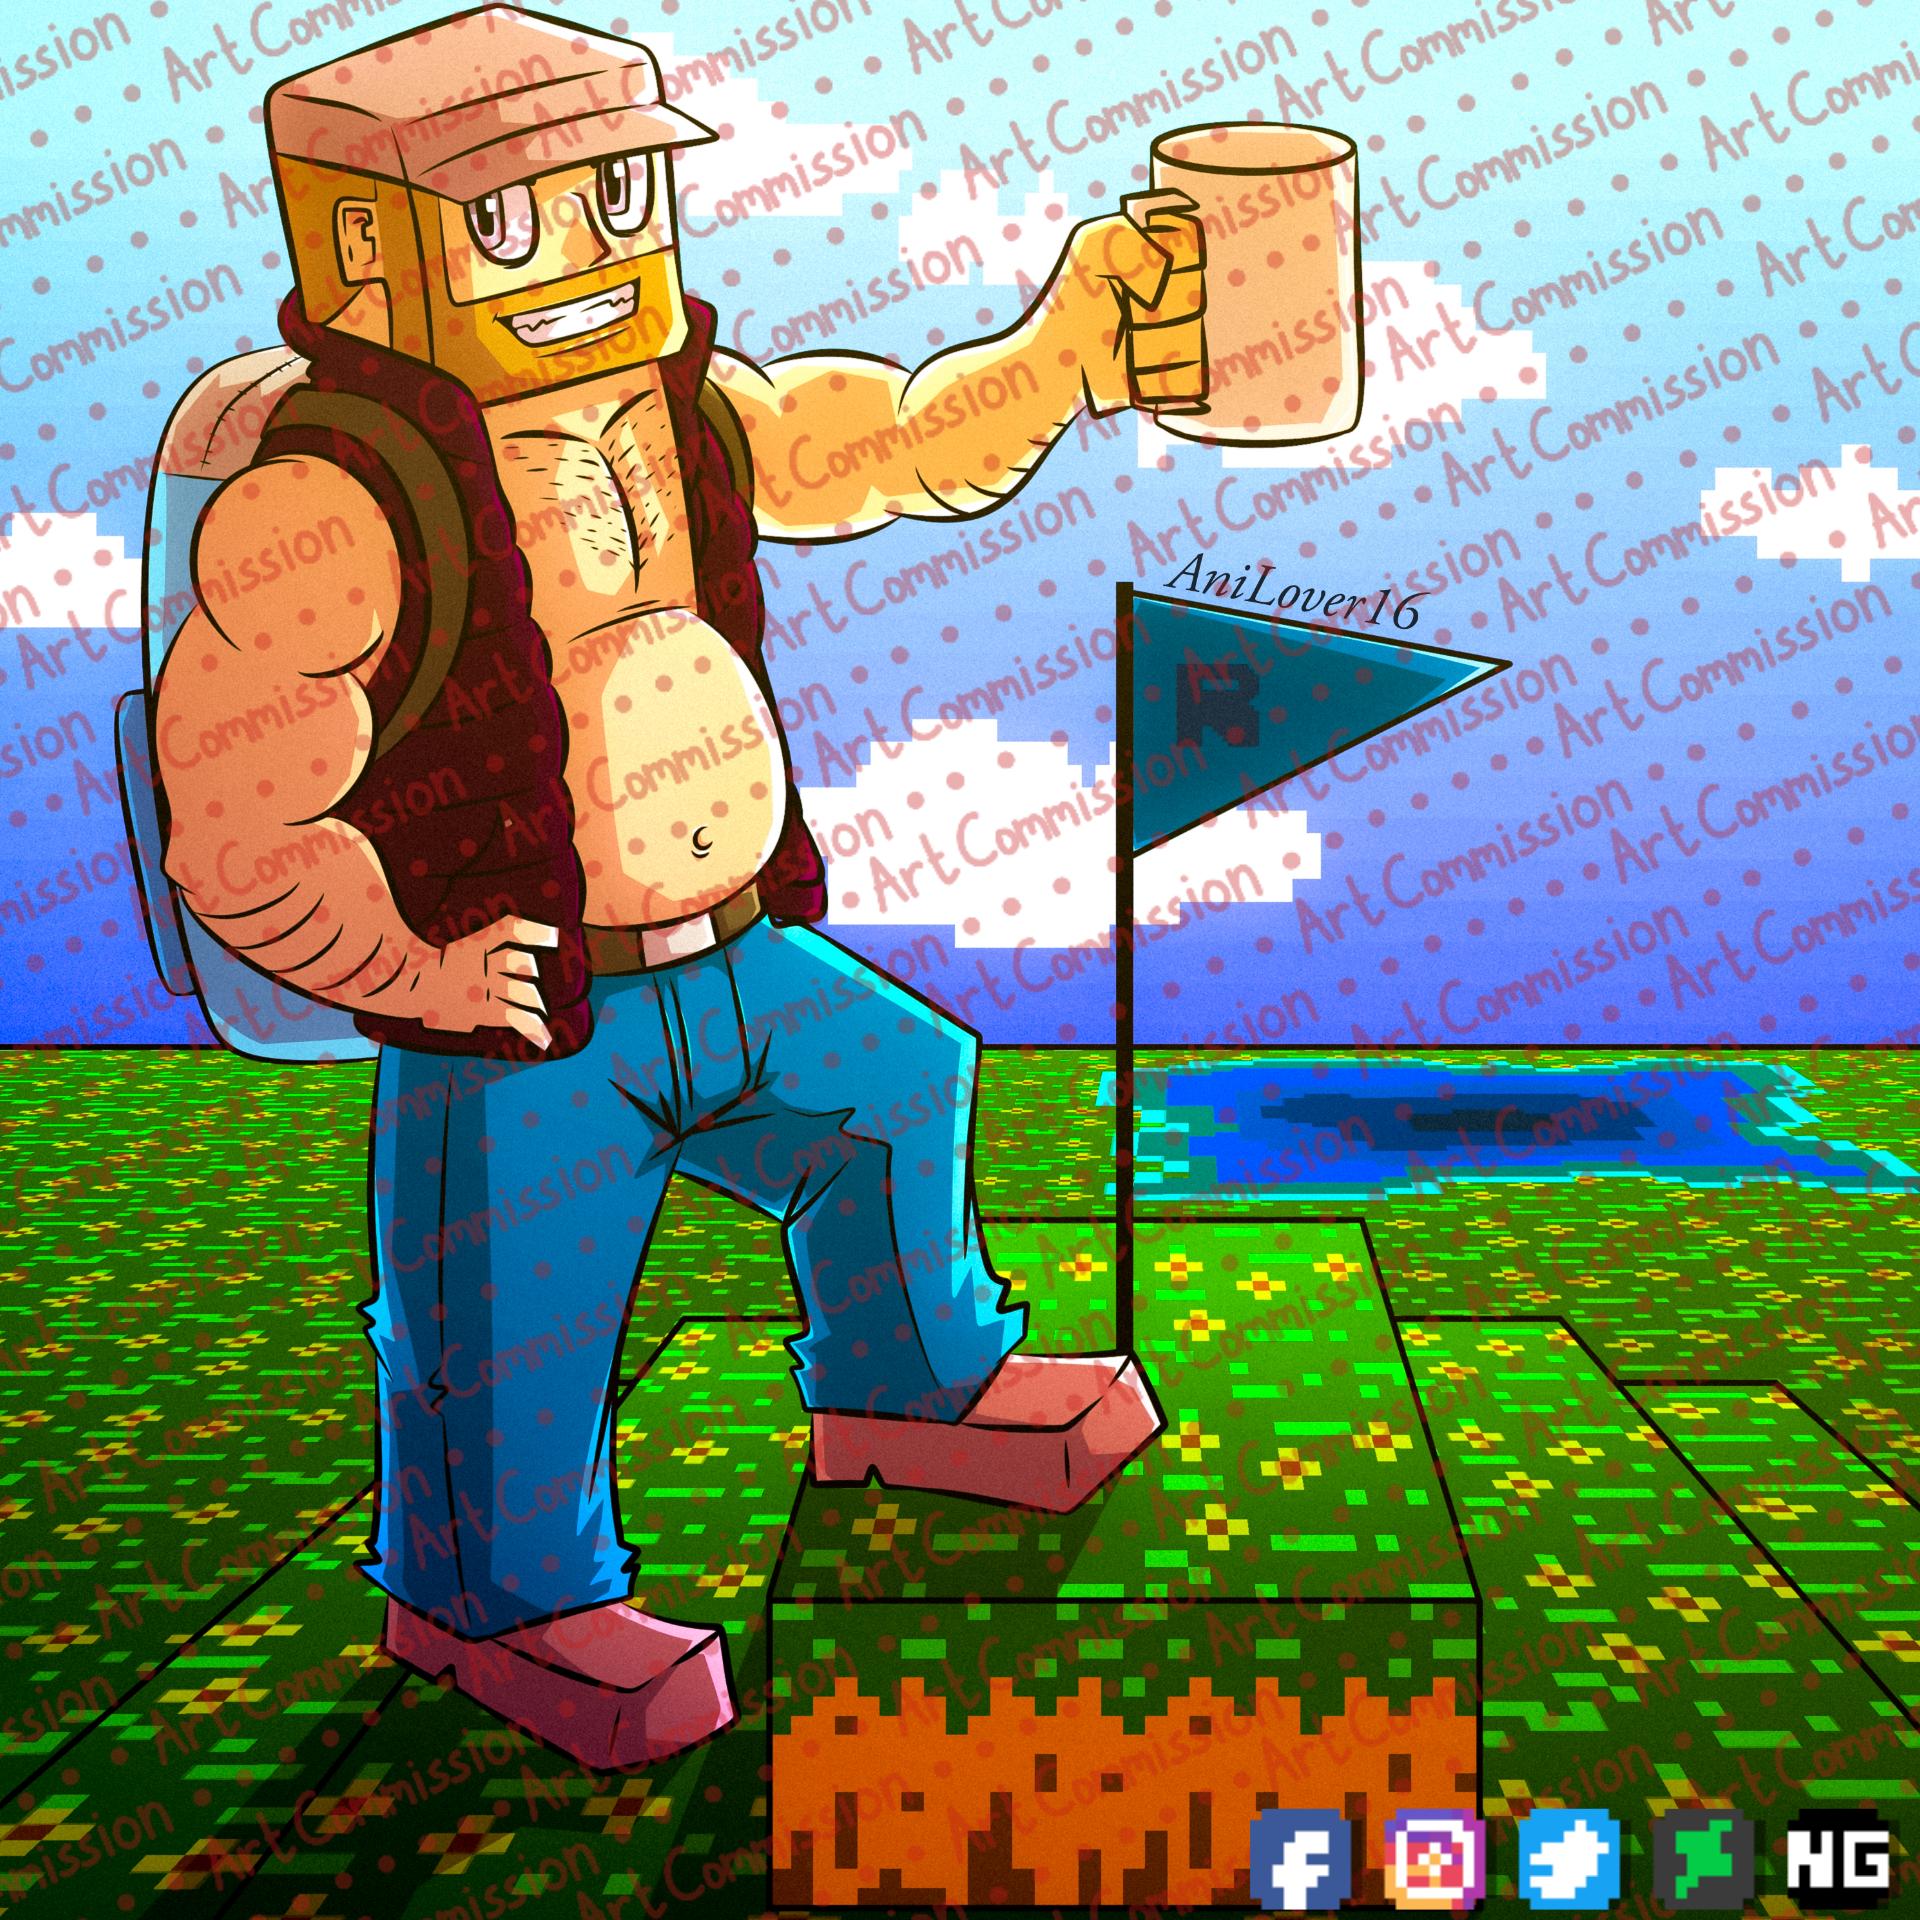 Art Commission July 2021 #1 - MinecraftArchitect90